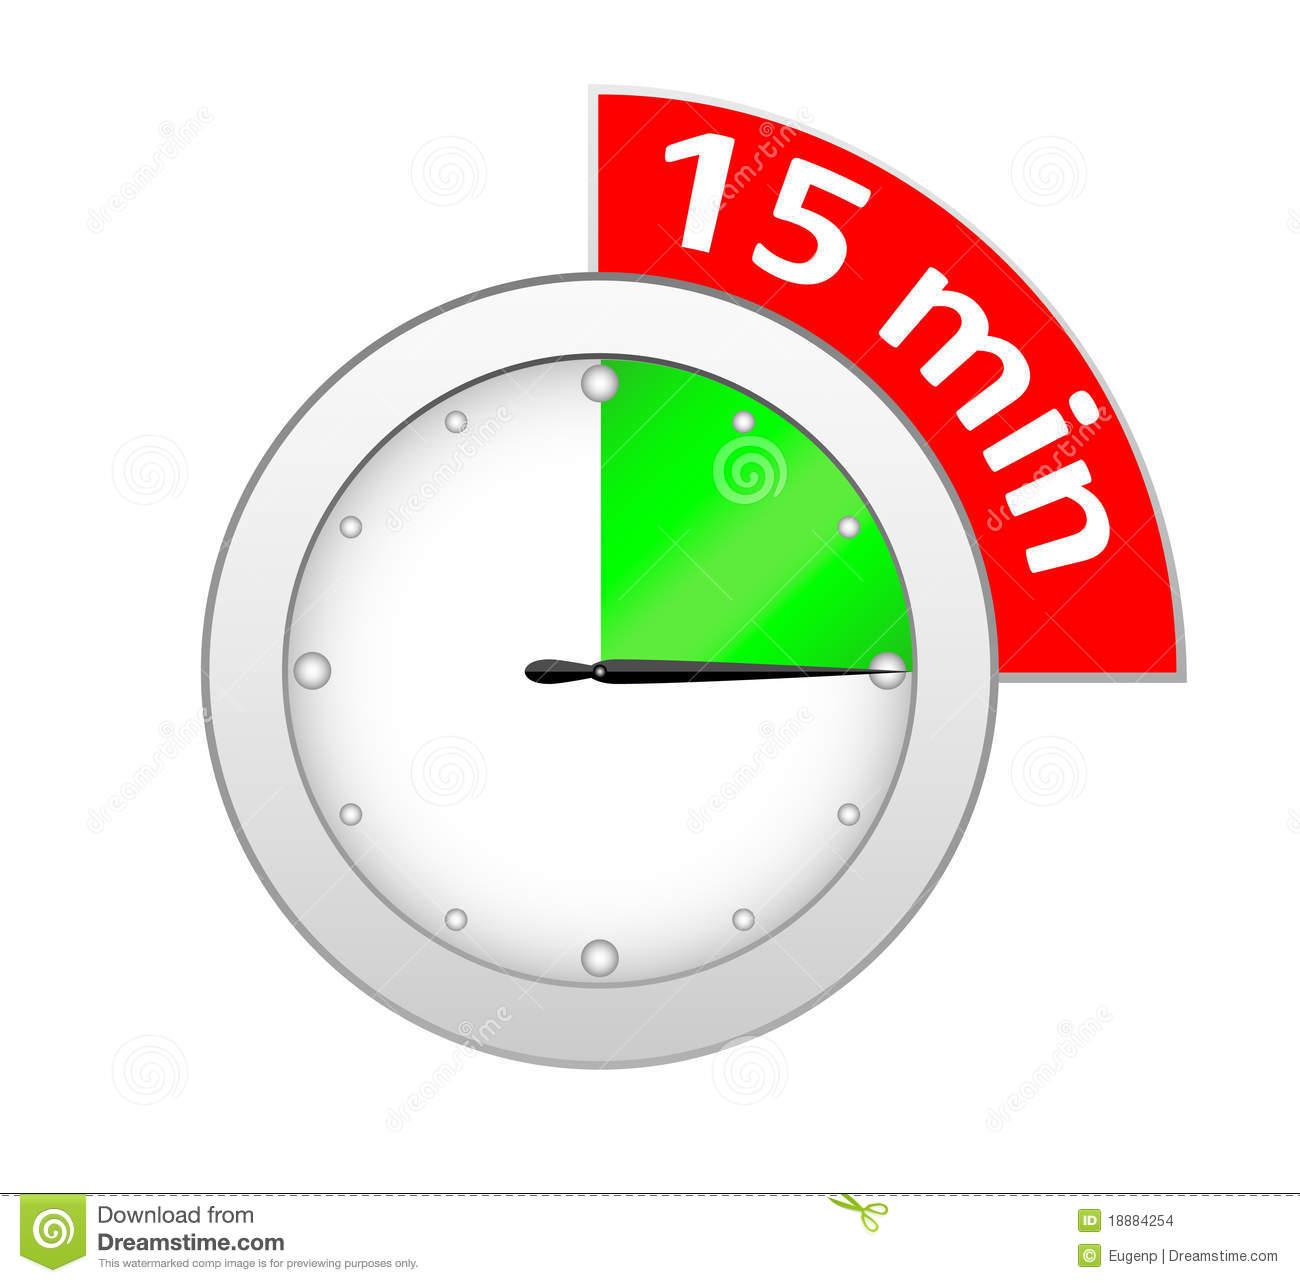 Timer 15 minutes stock vector. Illustration of number.